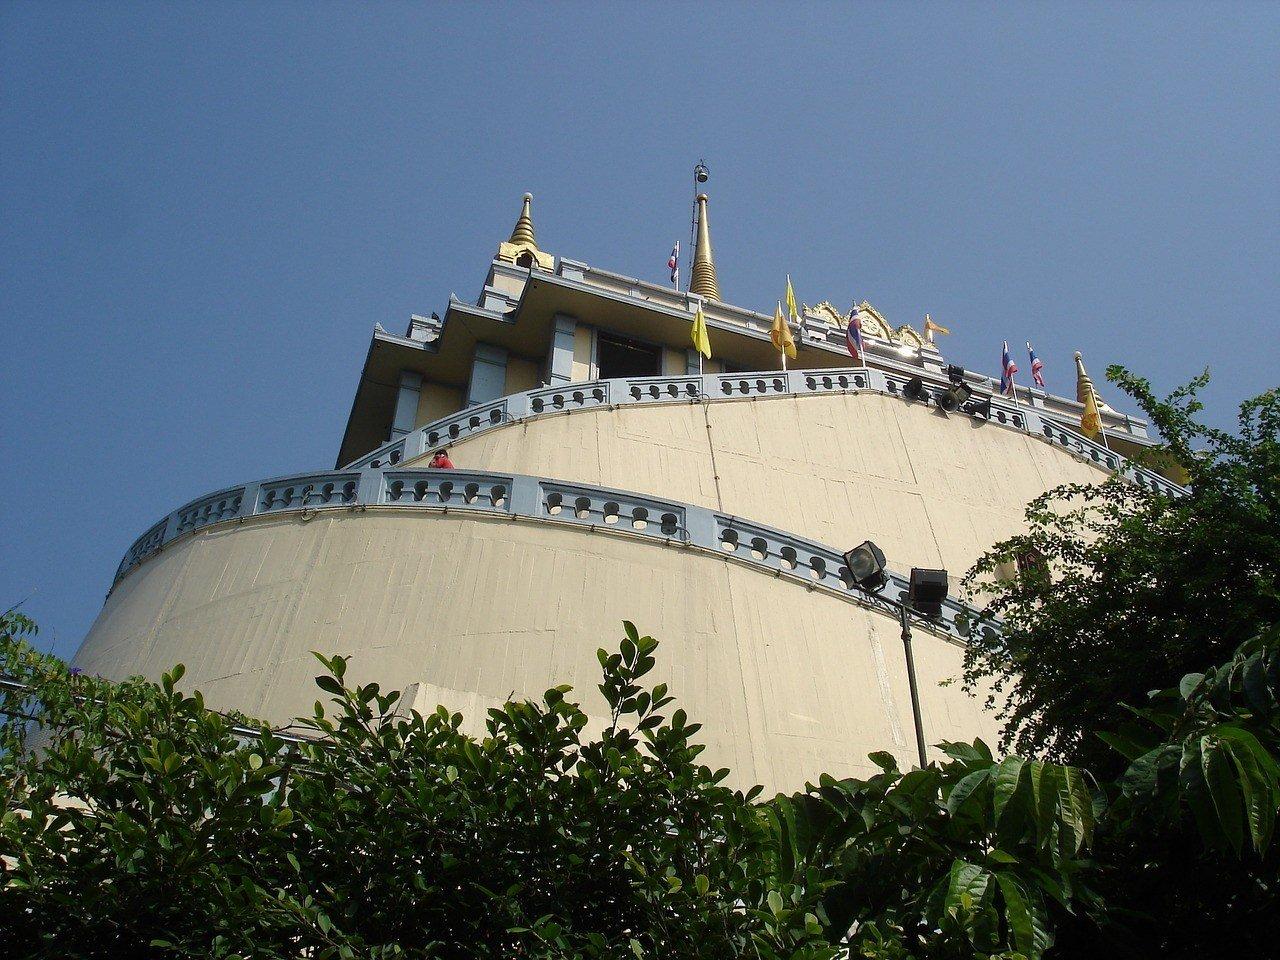 bangkok - The Golden Mount